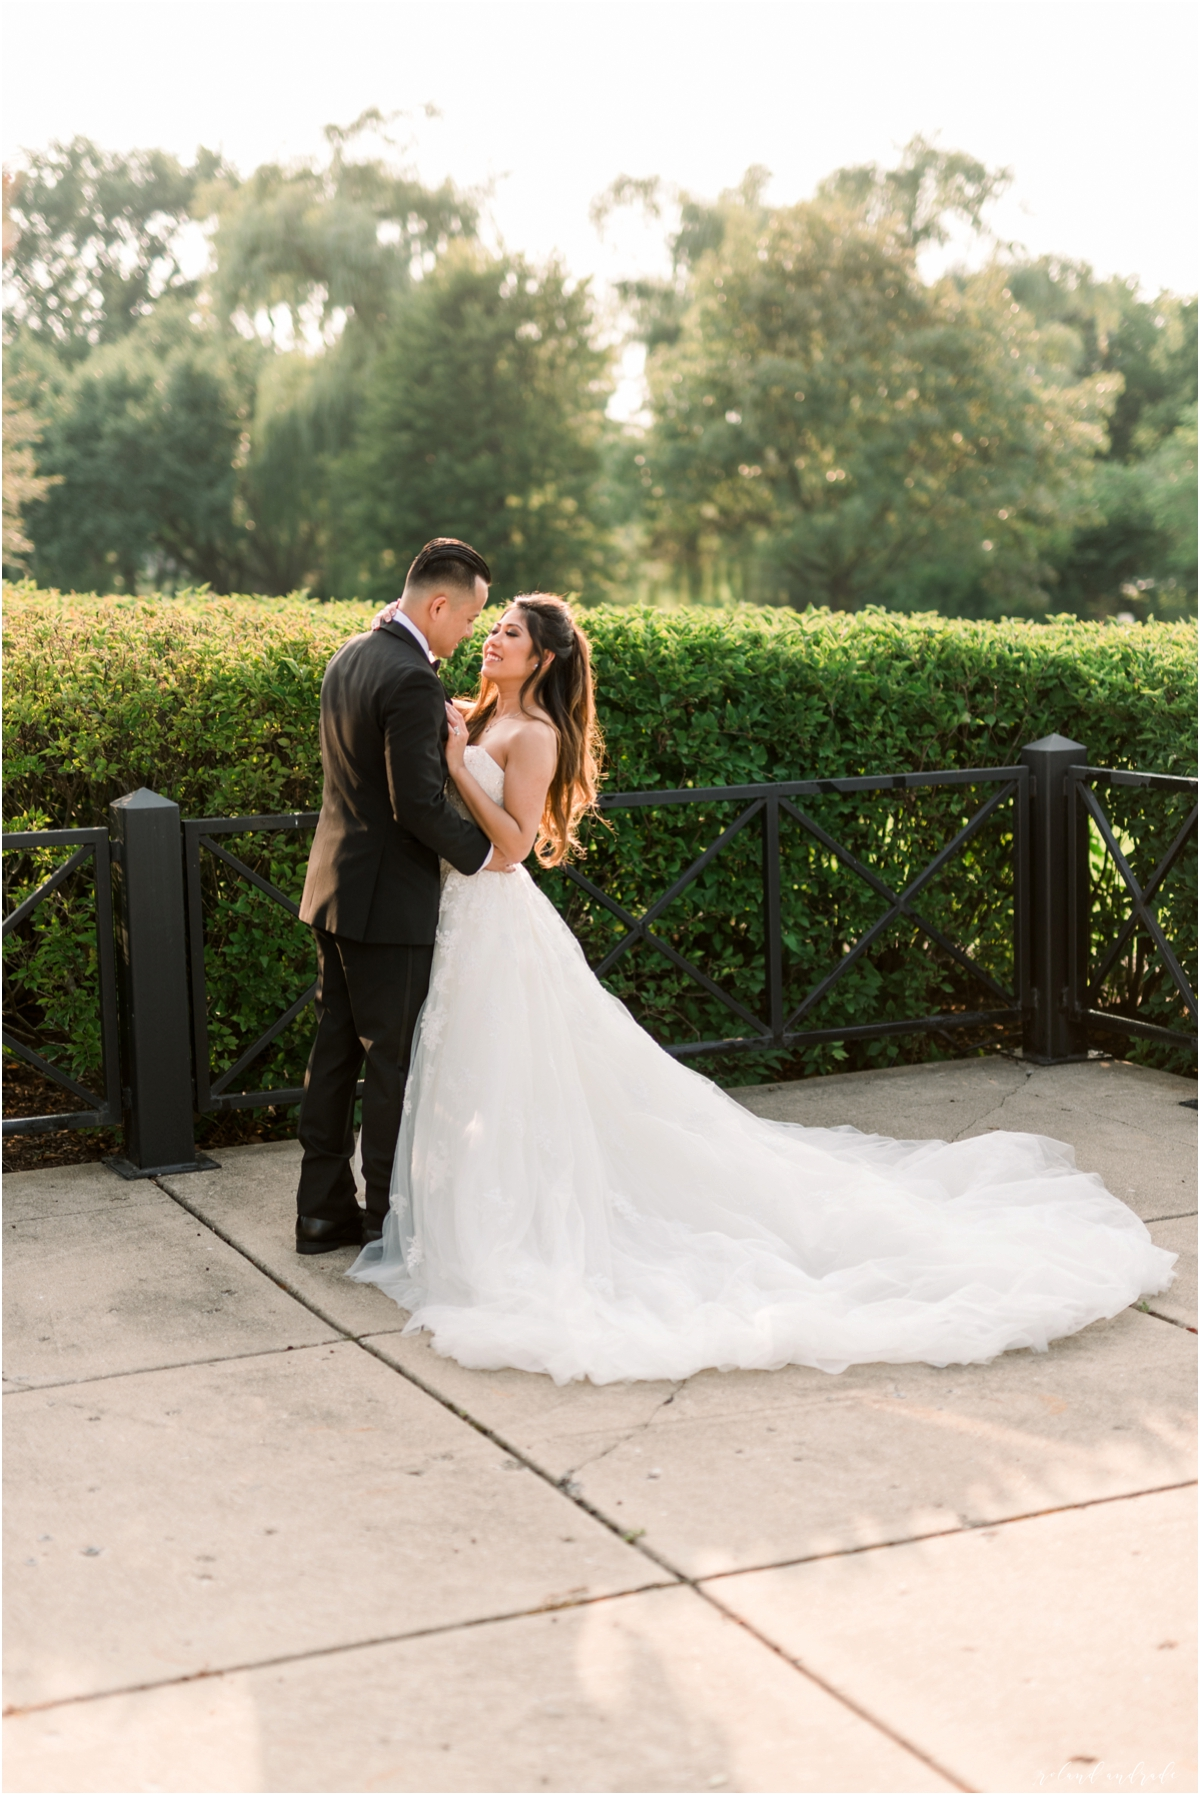 Meridian Banquets Wedding, Rolling Meadows Illinois Wedding, Chicago Wedding Photographer, Aurora Wedding Photographer, Best Photographer In Aurora, Best Photographer In Chicago_0084.jpg